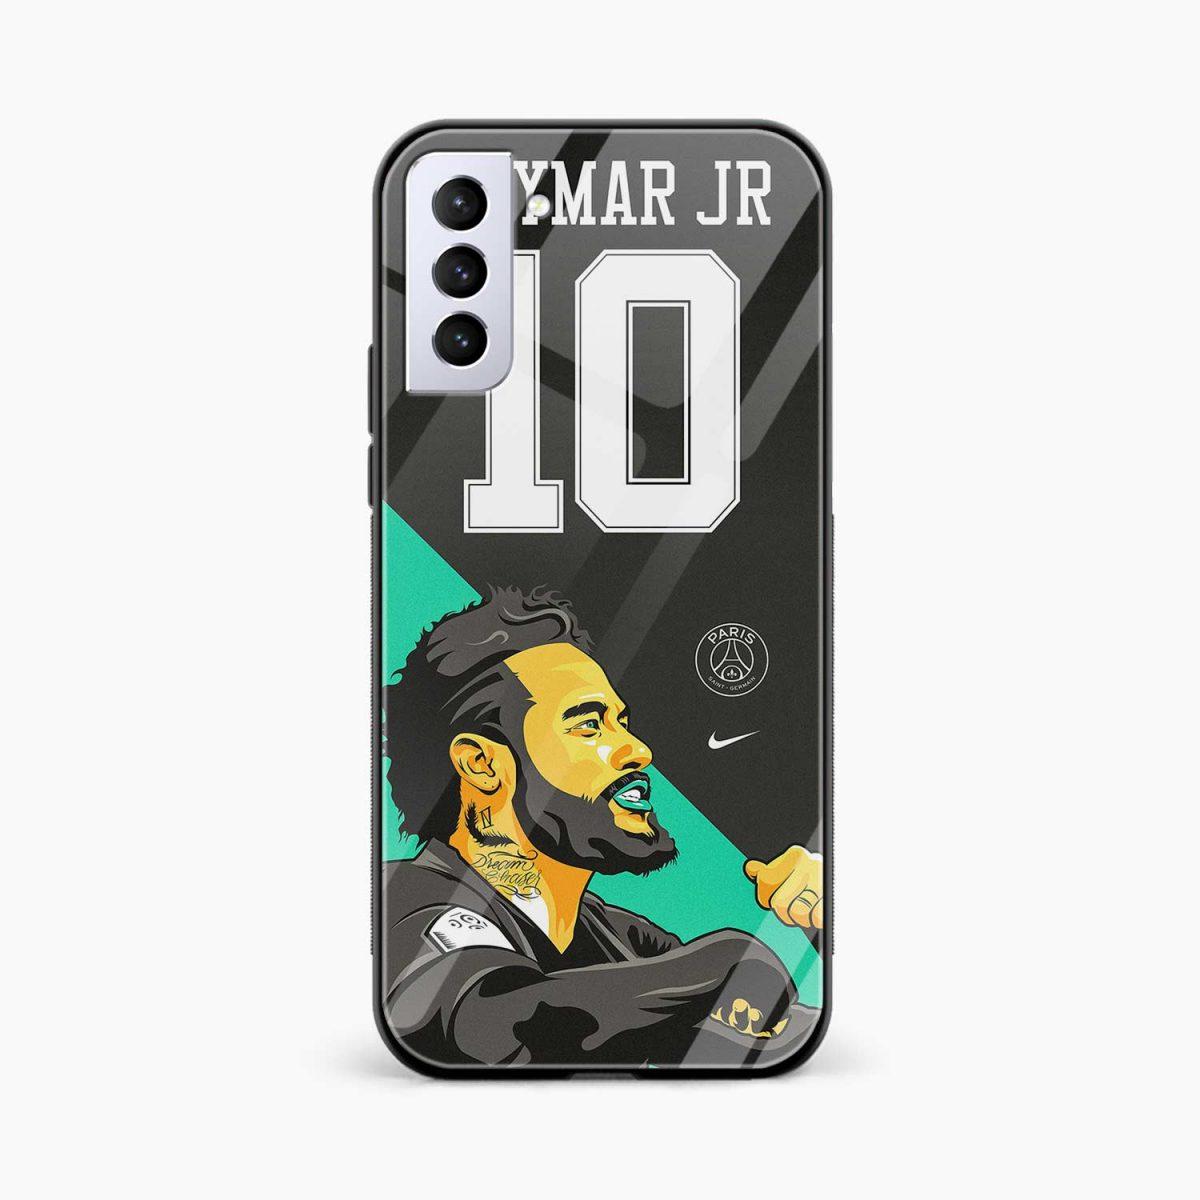 neymar jr 10 front view samsung s21 plug back cover 1